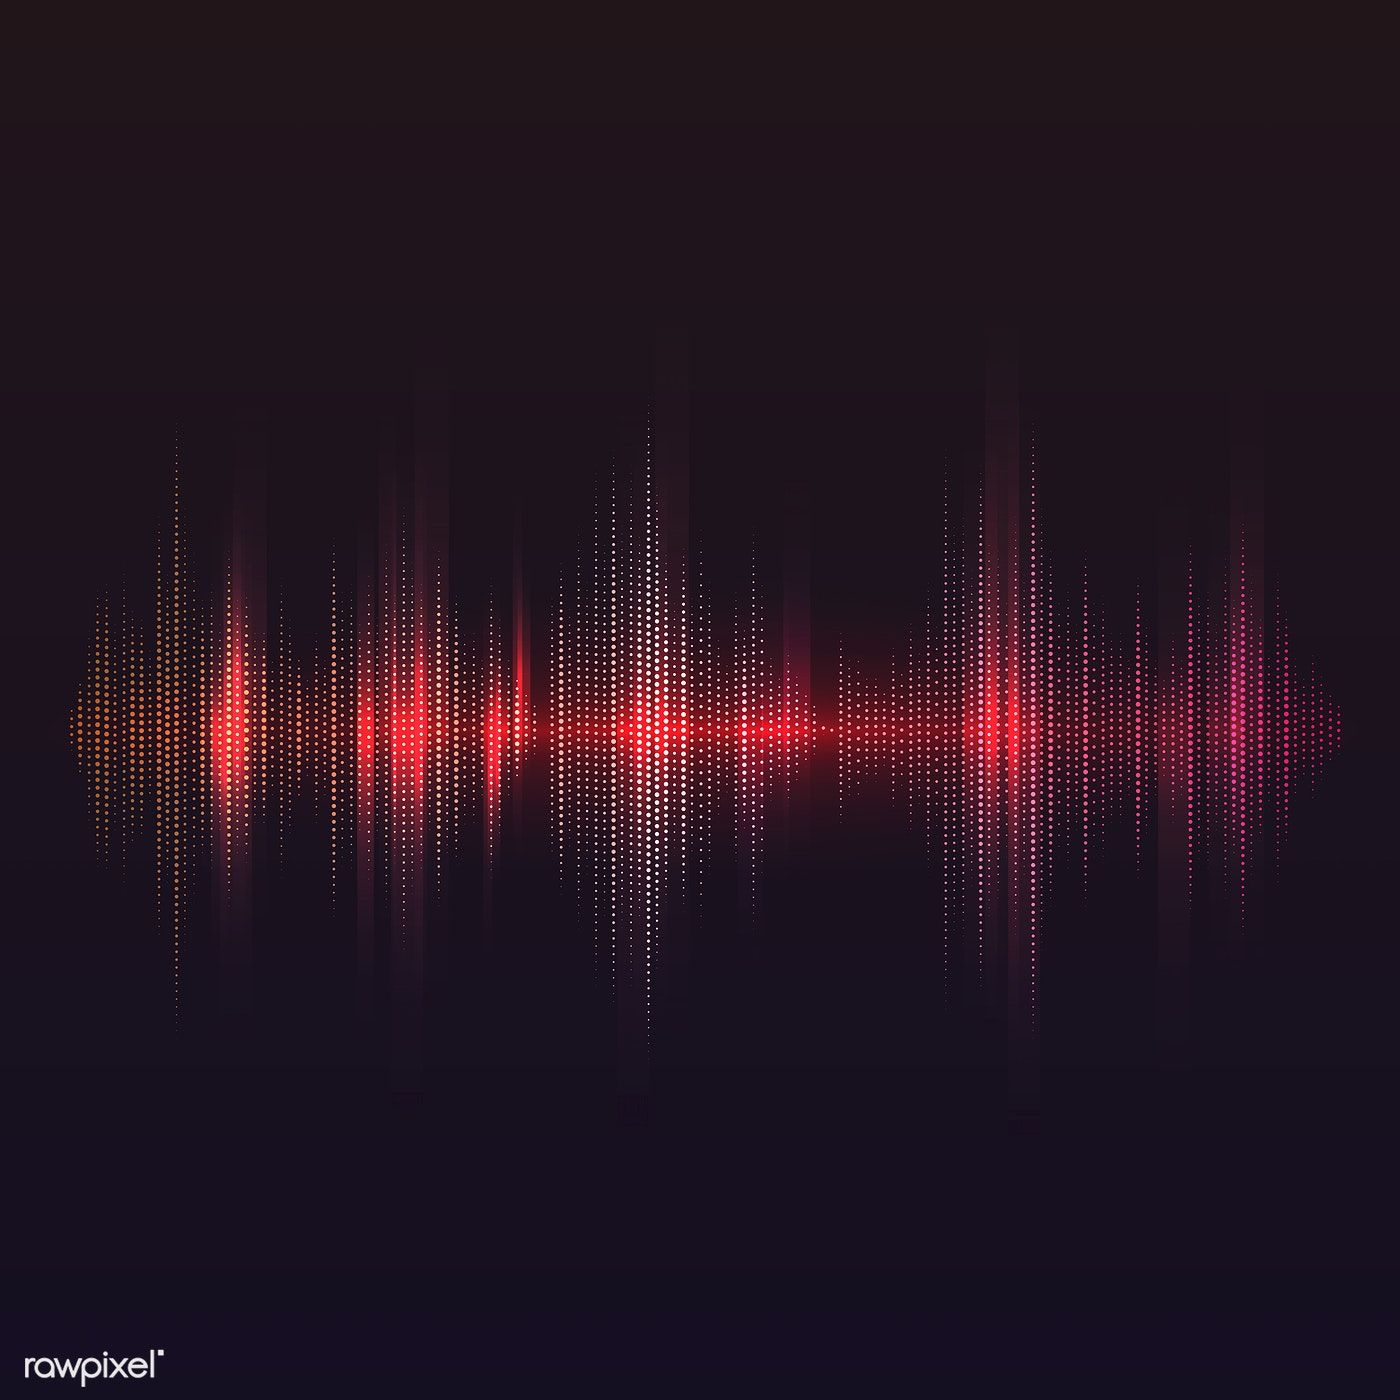 Red Sound Wave Equalizer Vector Design Free Image By Rawpixel Com Ilustracao De Onda Tatuagem Onda Sonora Vetores Free